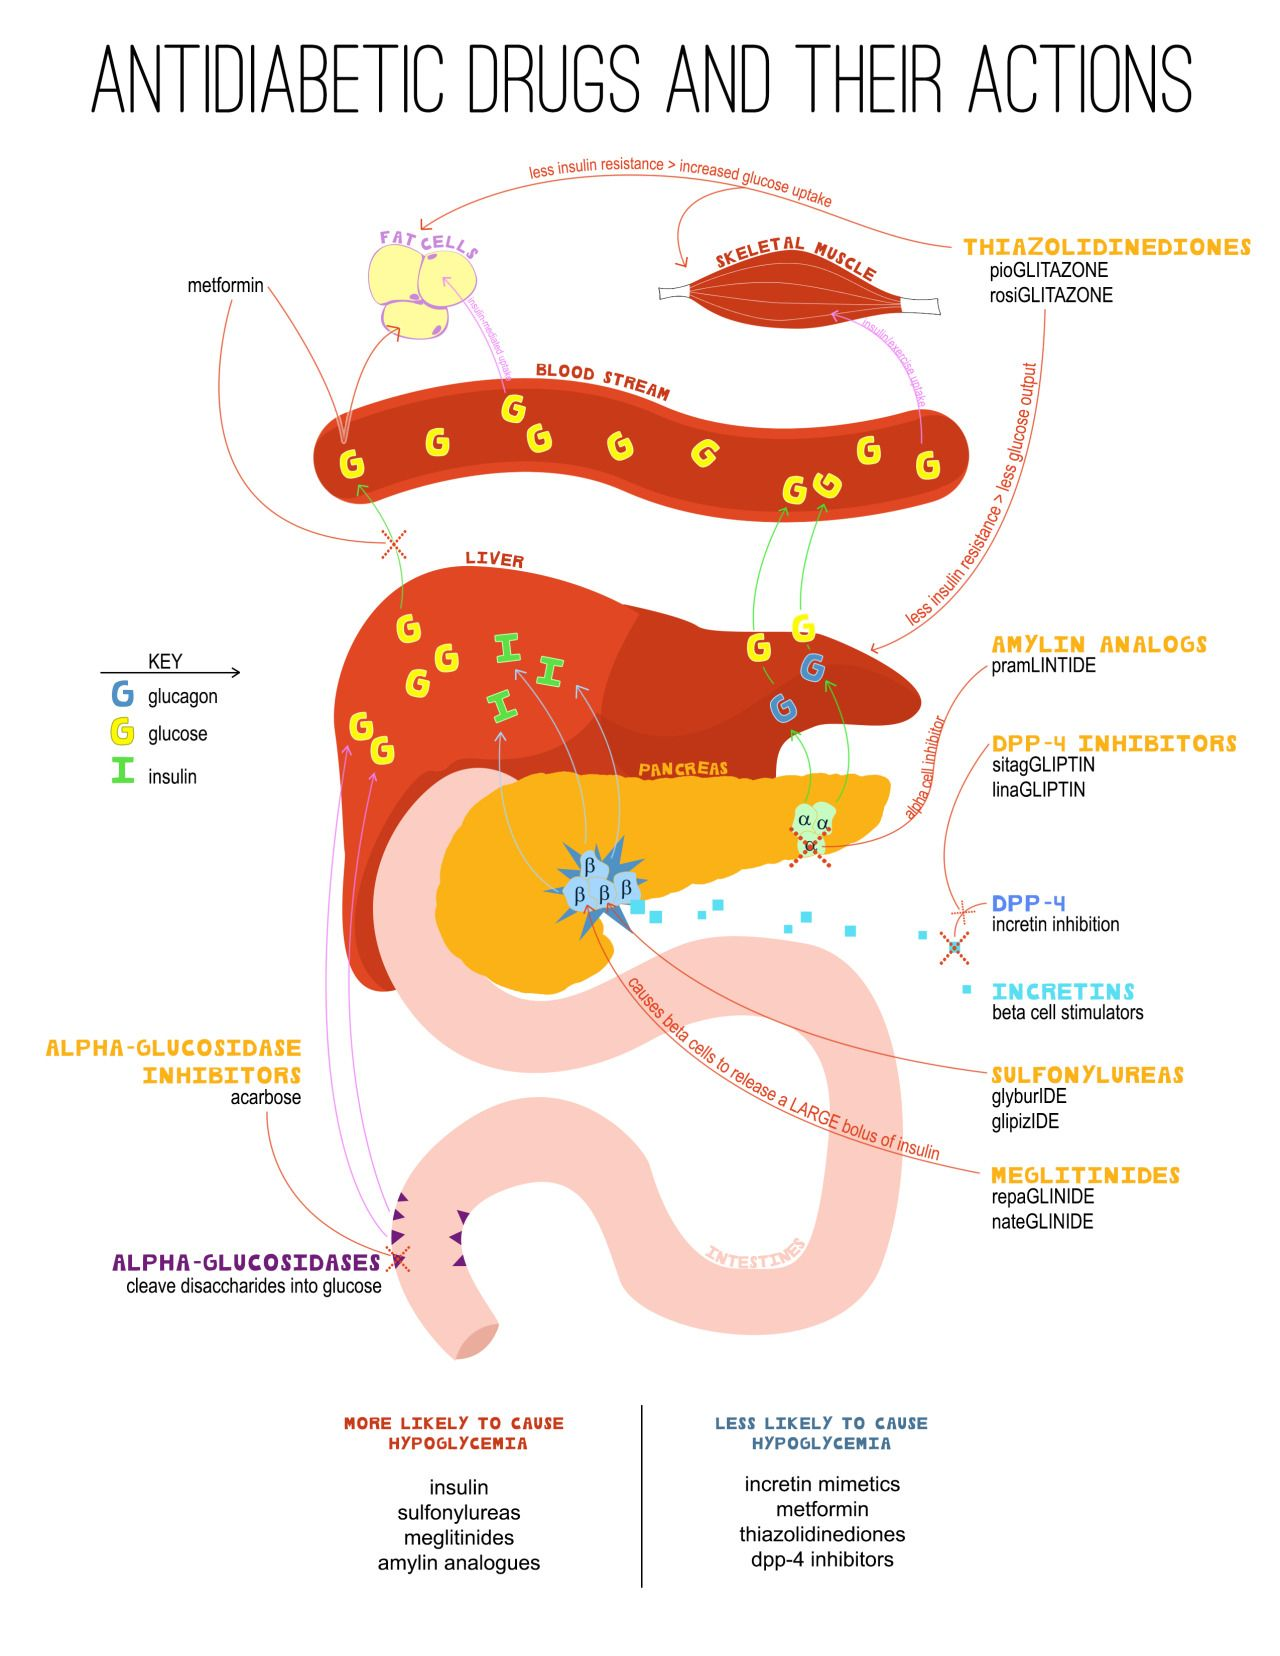 Cardiac Pharmacology Diagram | Quizlet